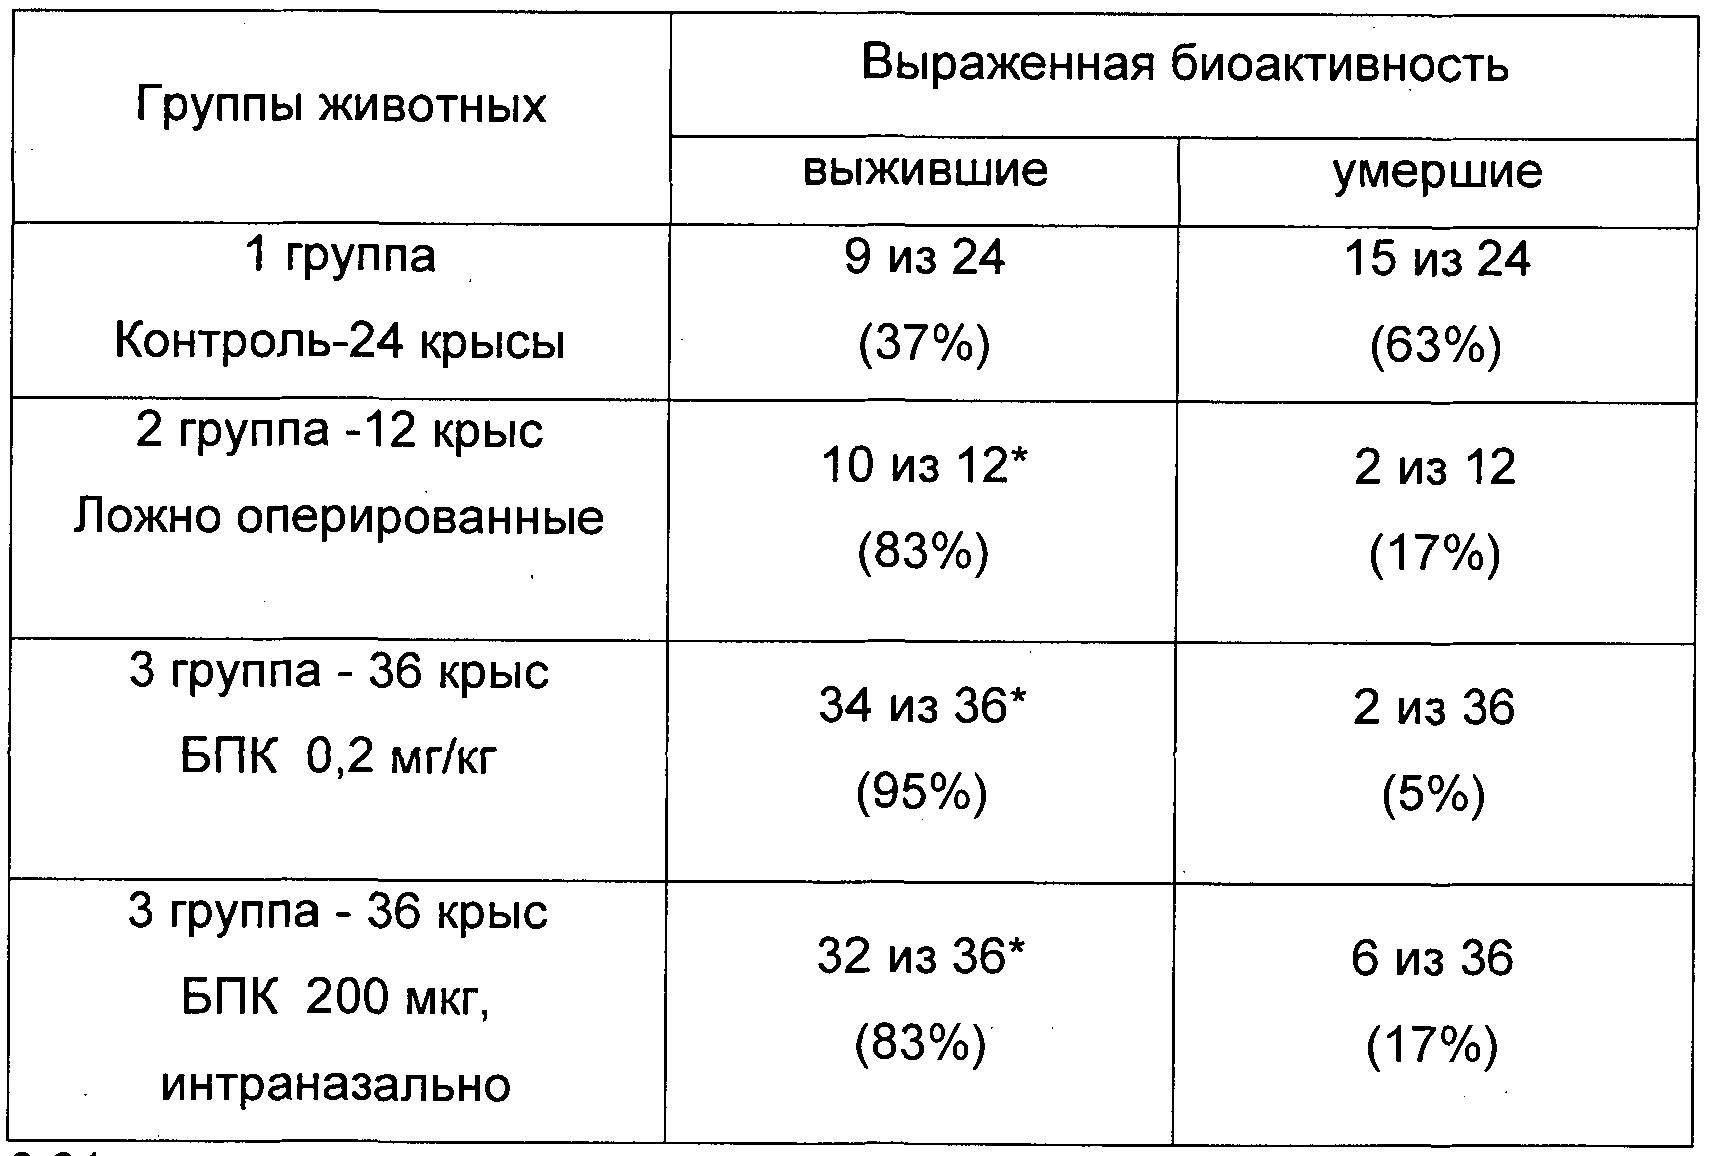 Анализ мочи показатели bld trace-cysed Прививочная карта 063 у Шипиловская улица